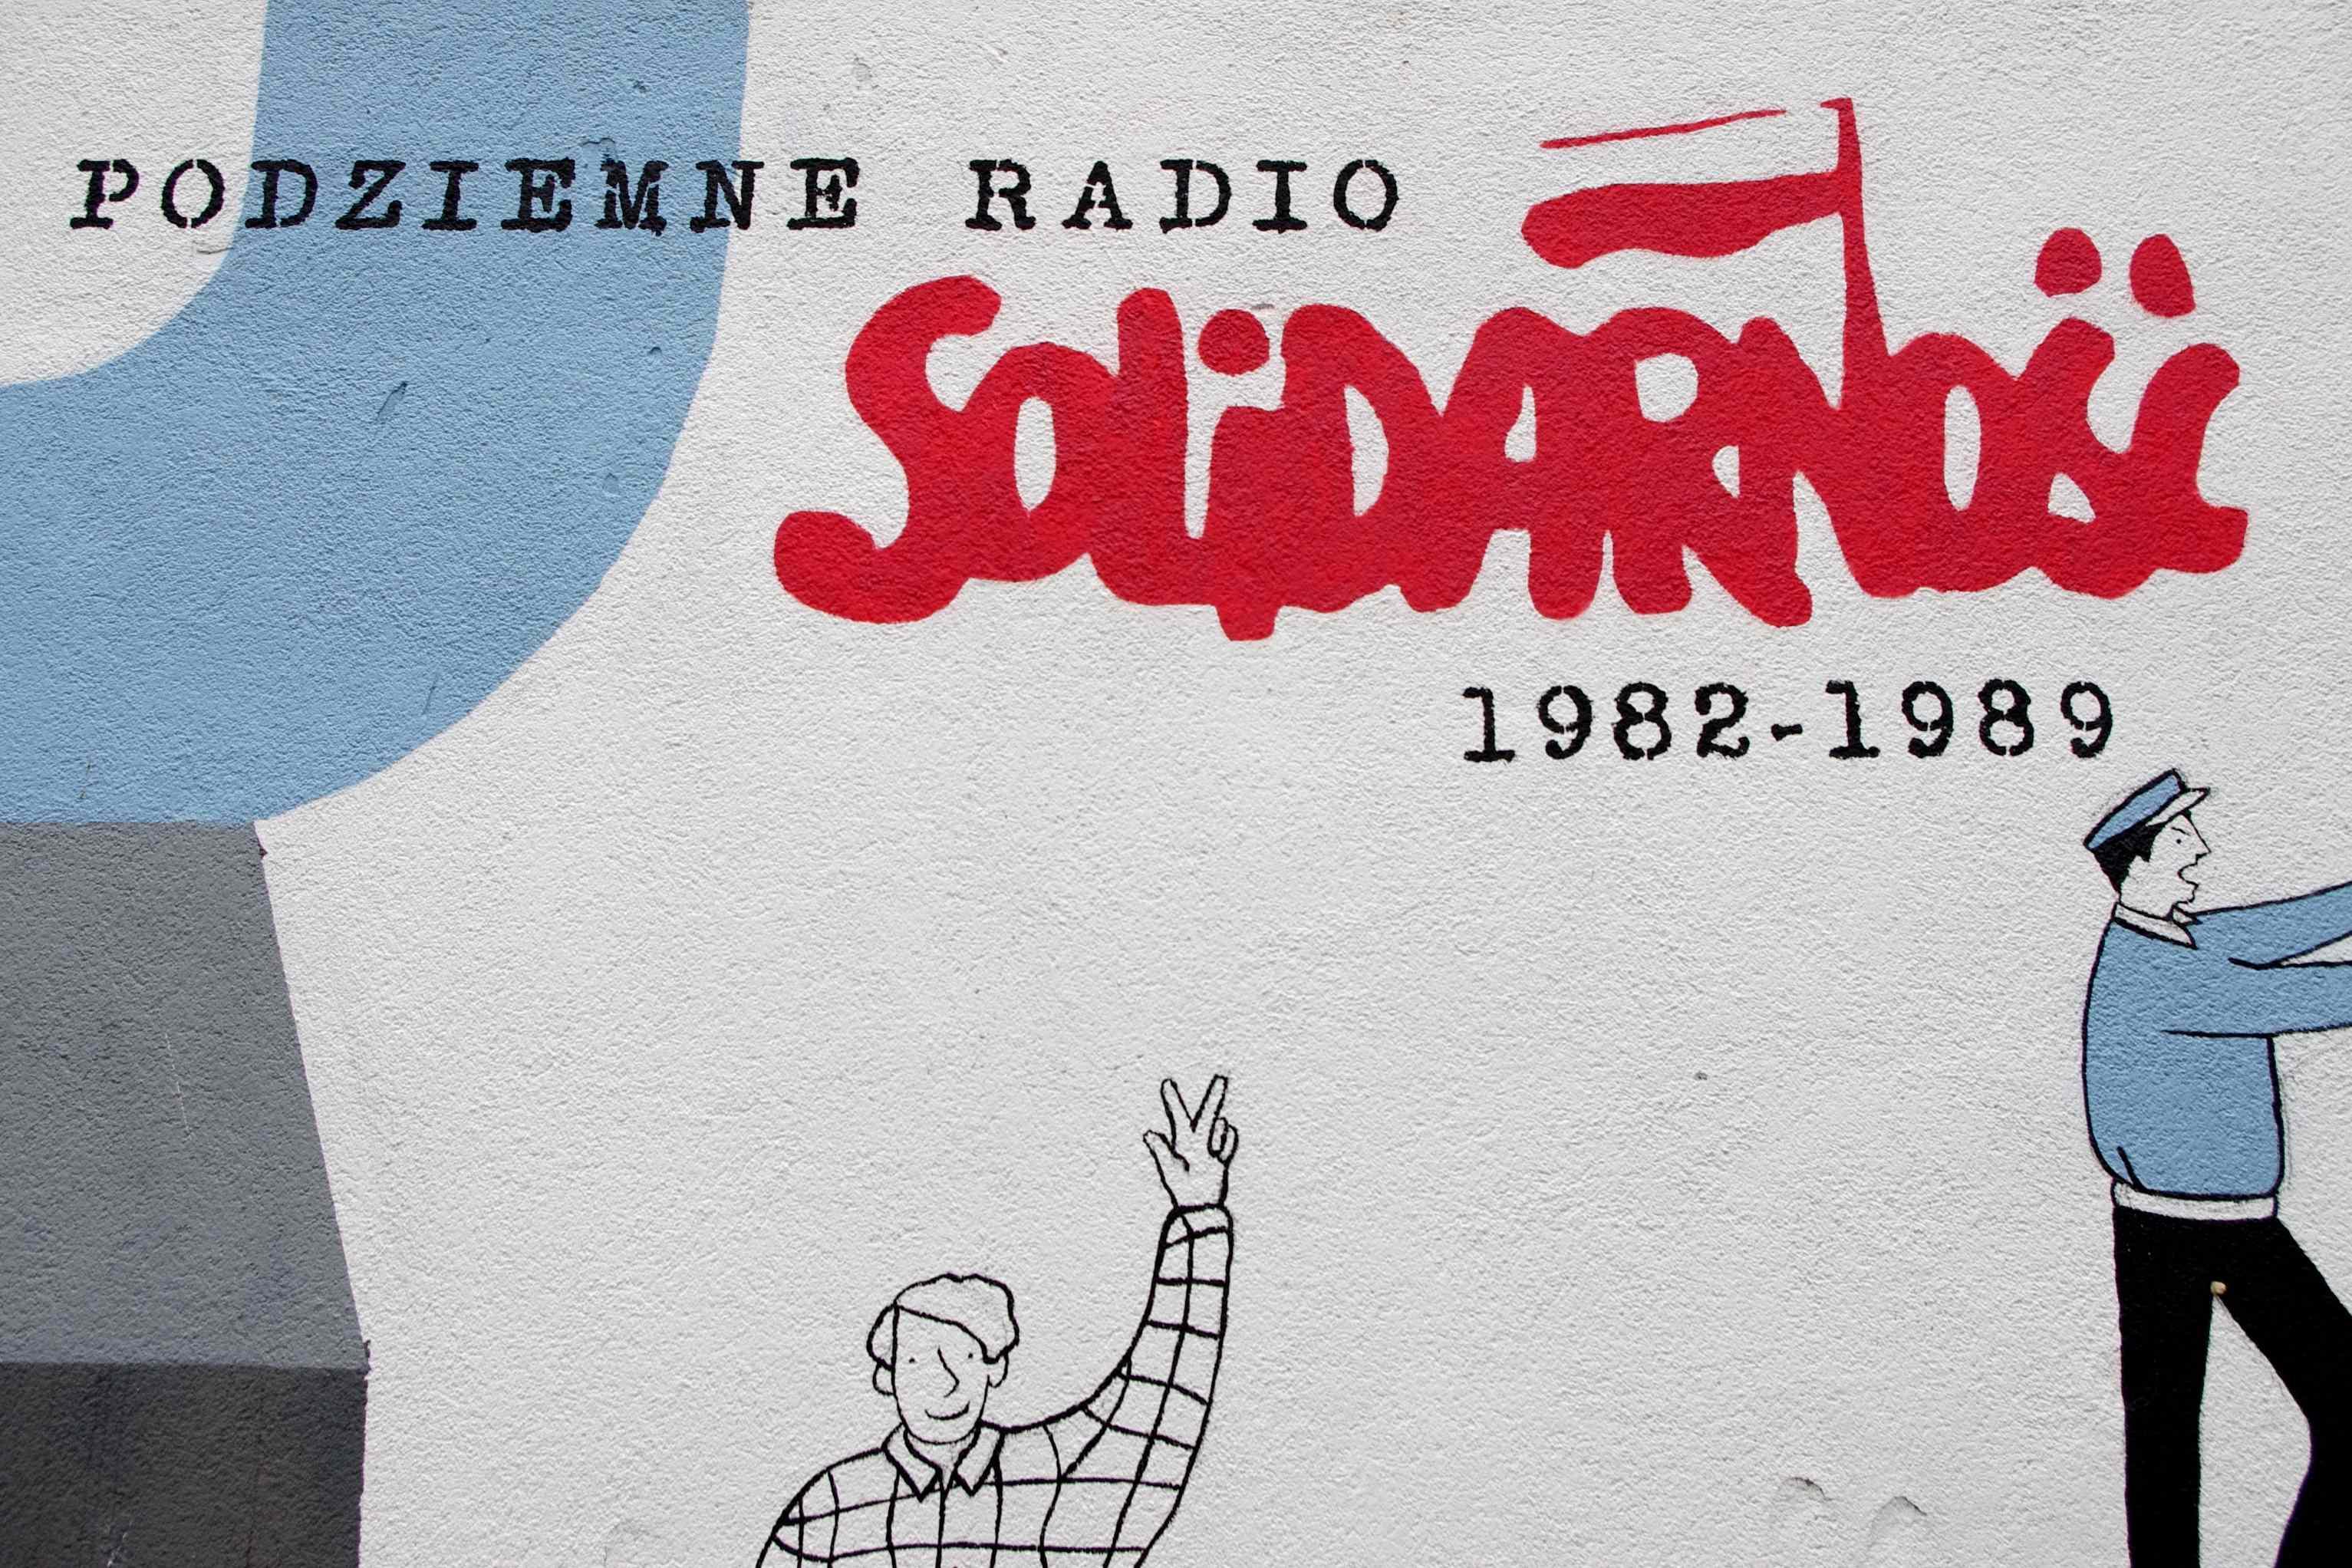 Radio Solidarita vysílalo od roku 1982 do roku 1989